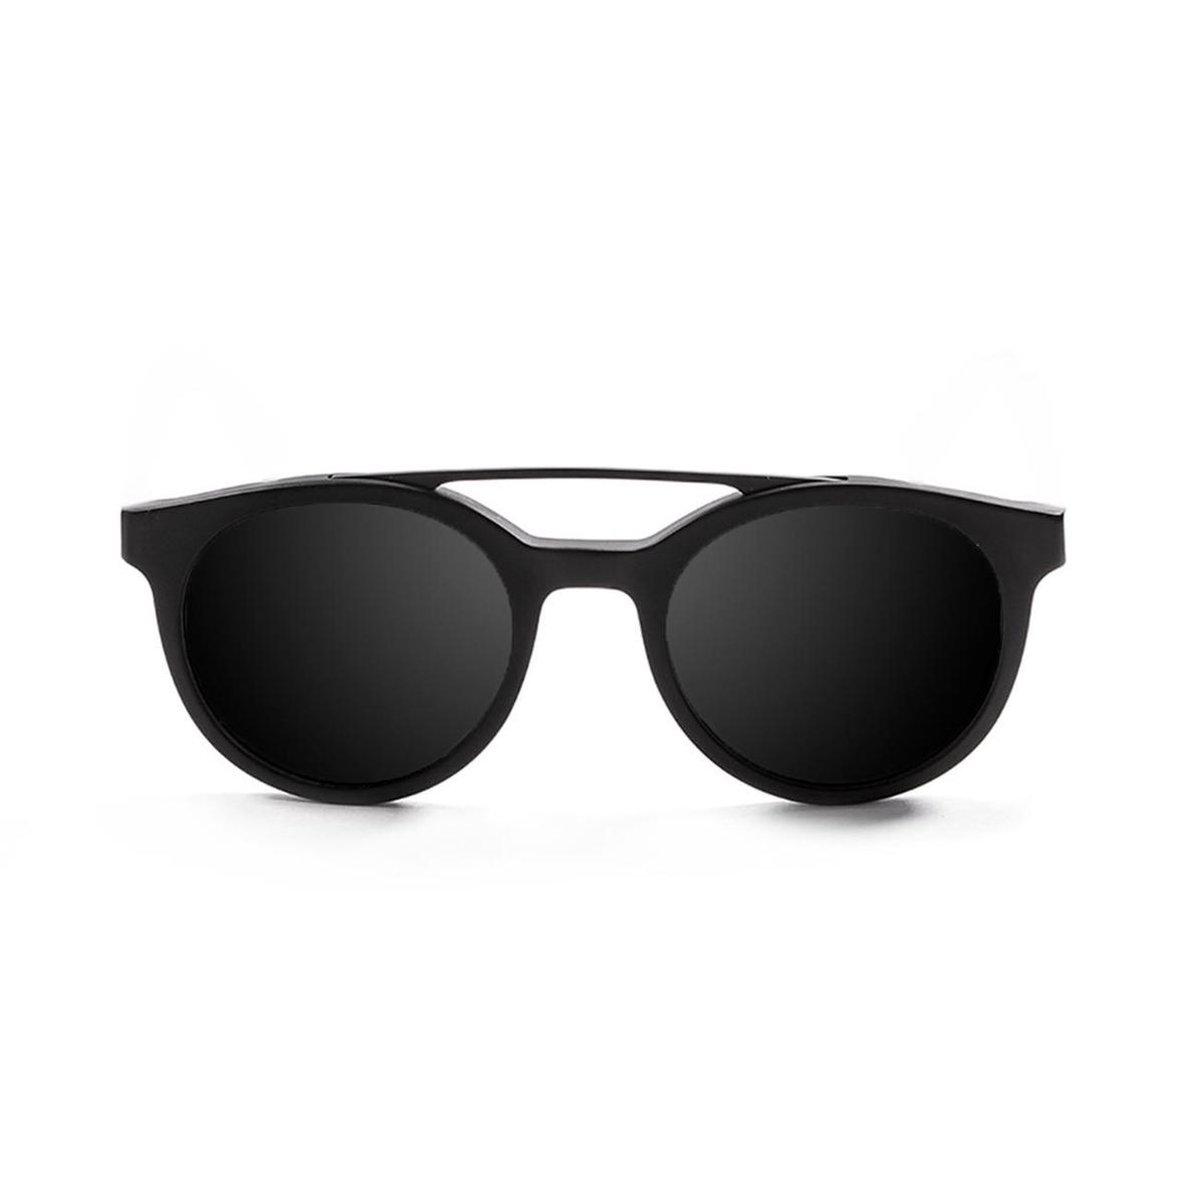 Ocean Sunglasses - Zonnebril - Unisex - 10200-0_TIBURON_MATTEBLACK-SMOKE - Ocean Sunglasses